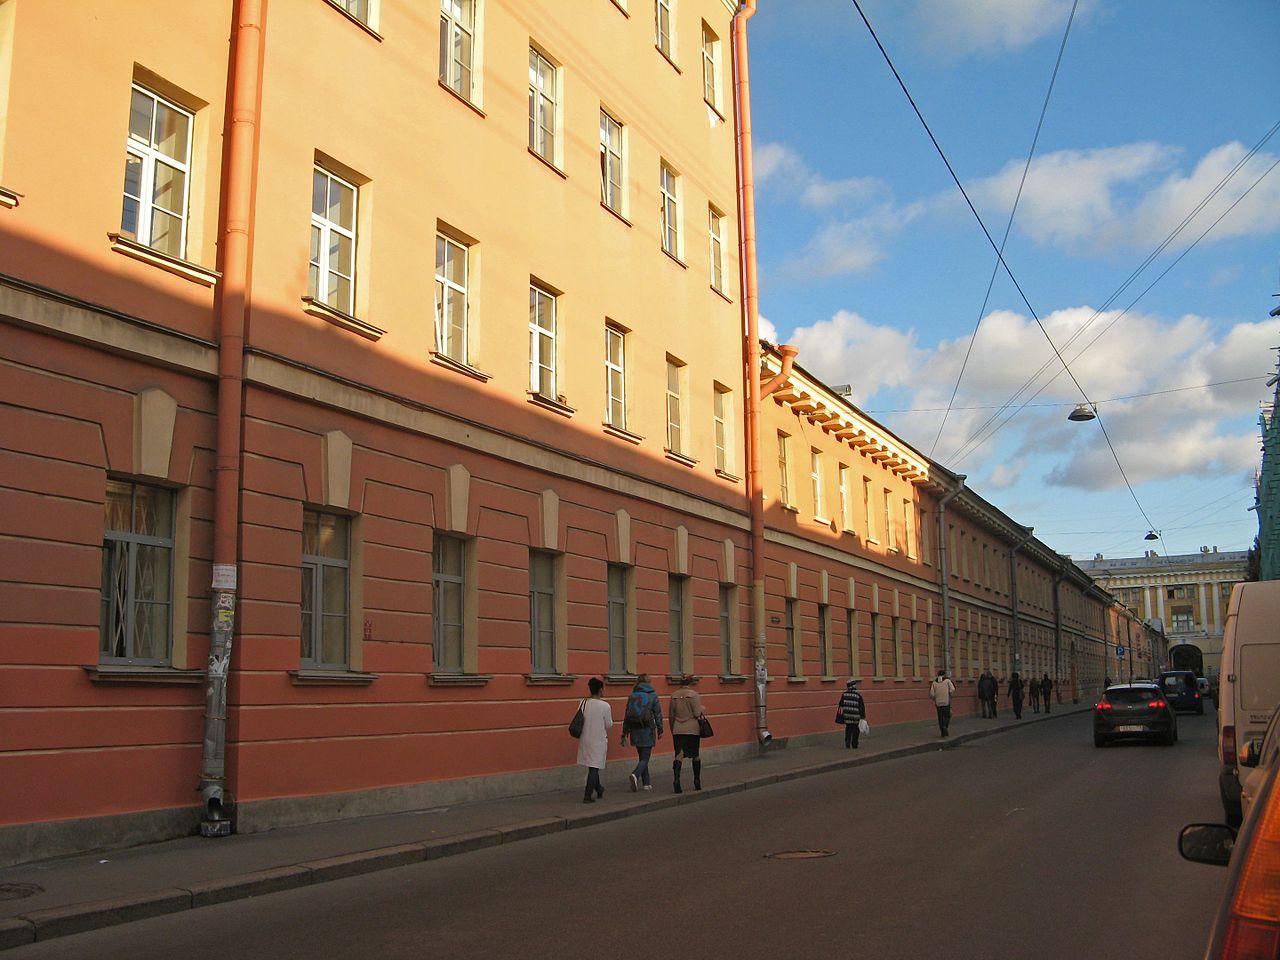 Воронцовский дворец в Санкт-Петербурге, службы по ул. Ломоносова